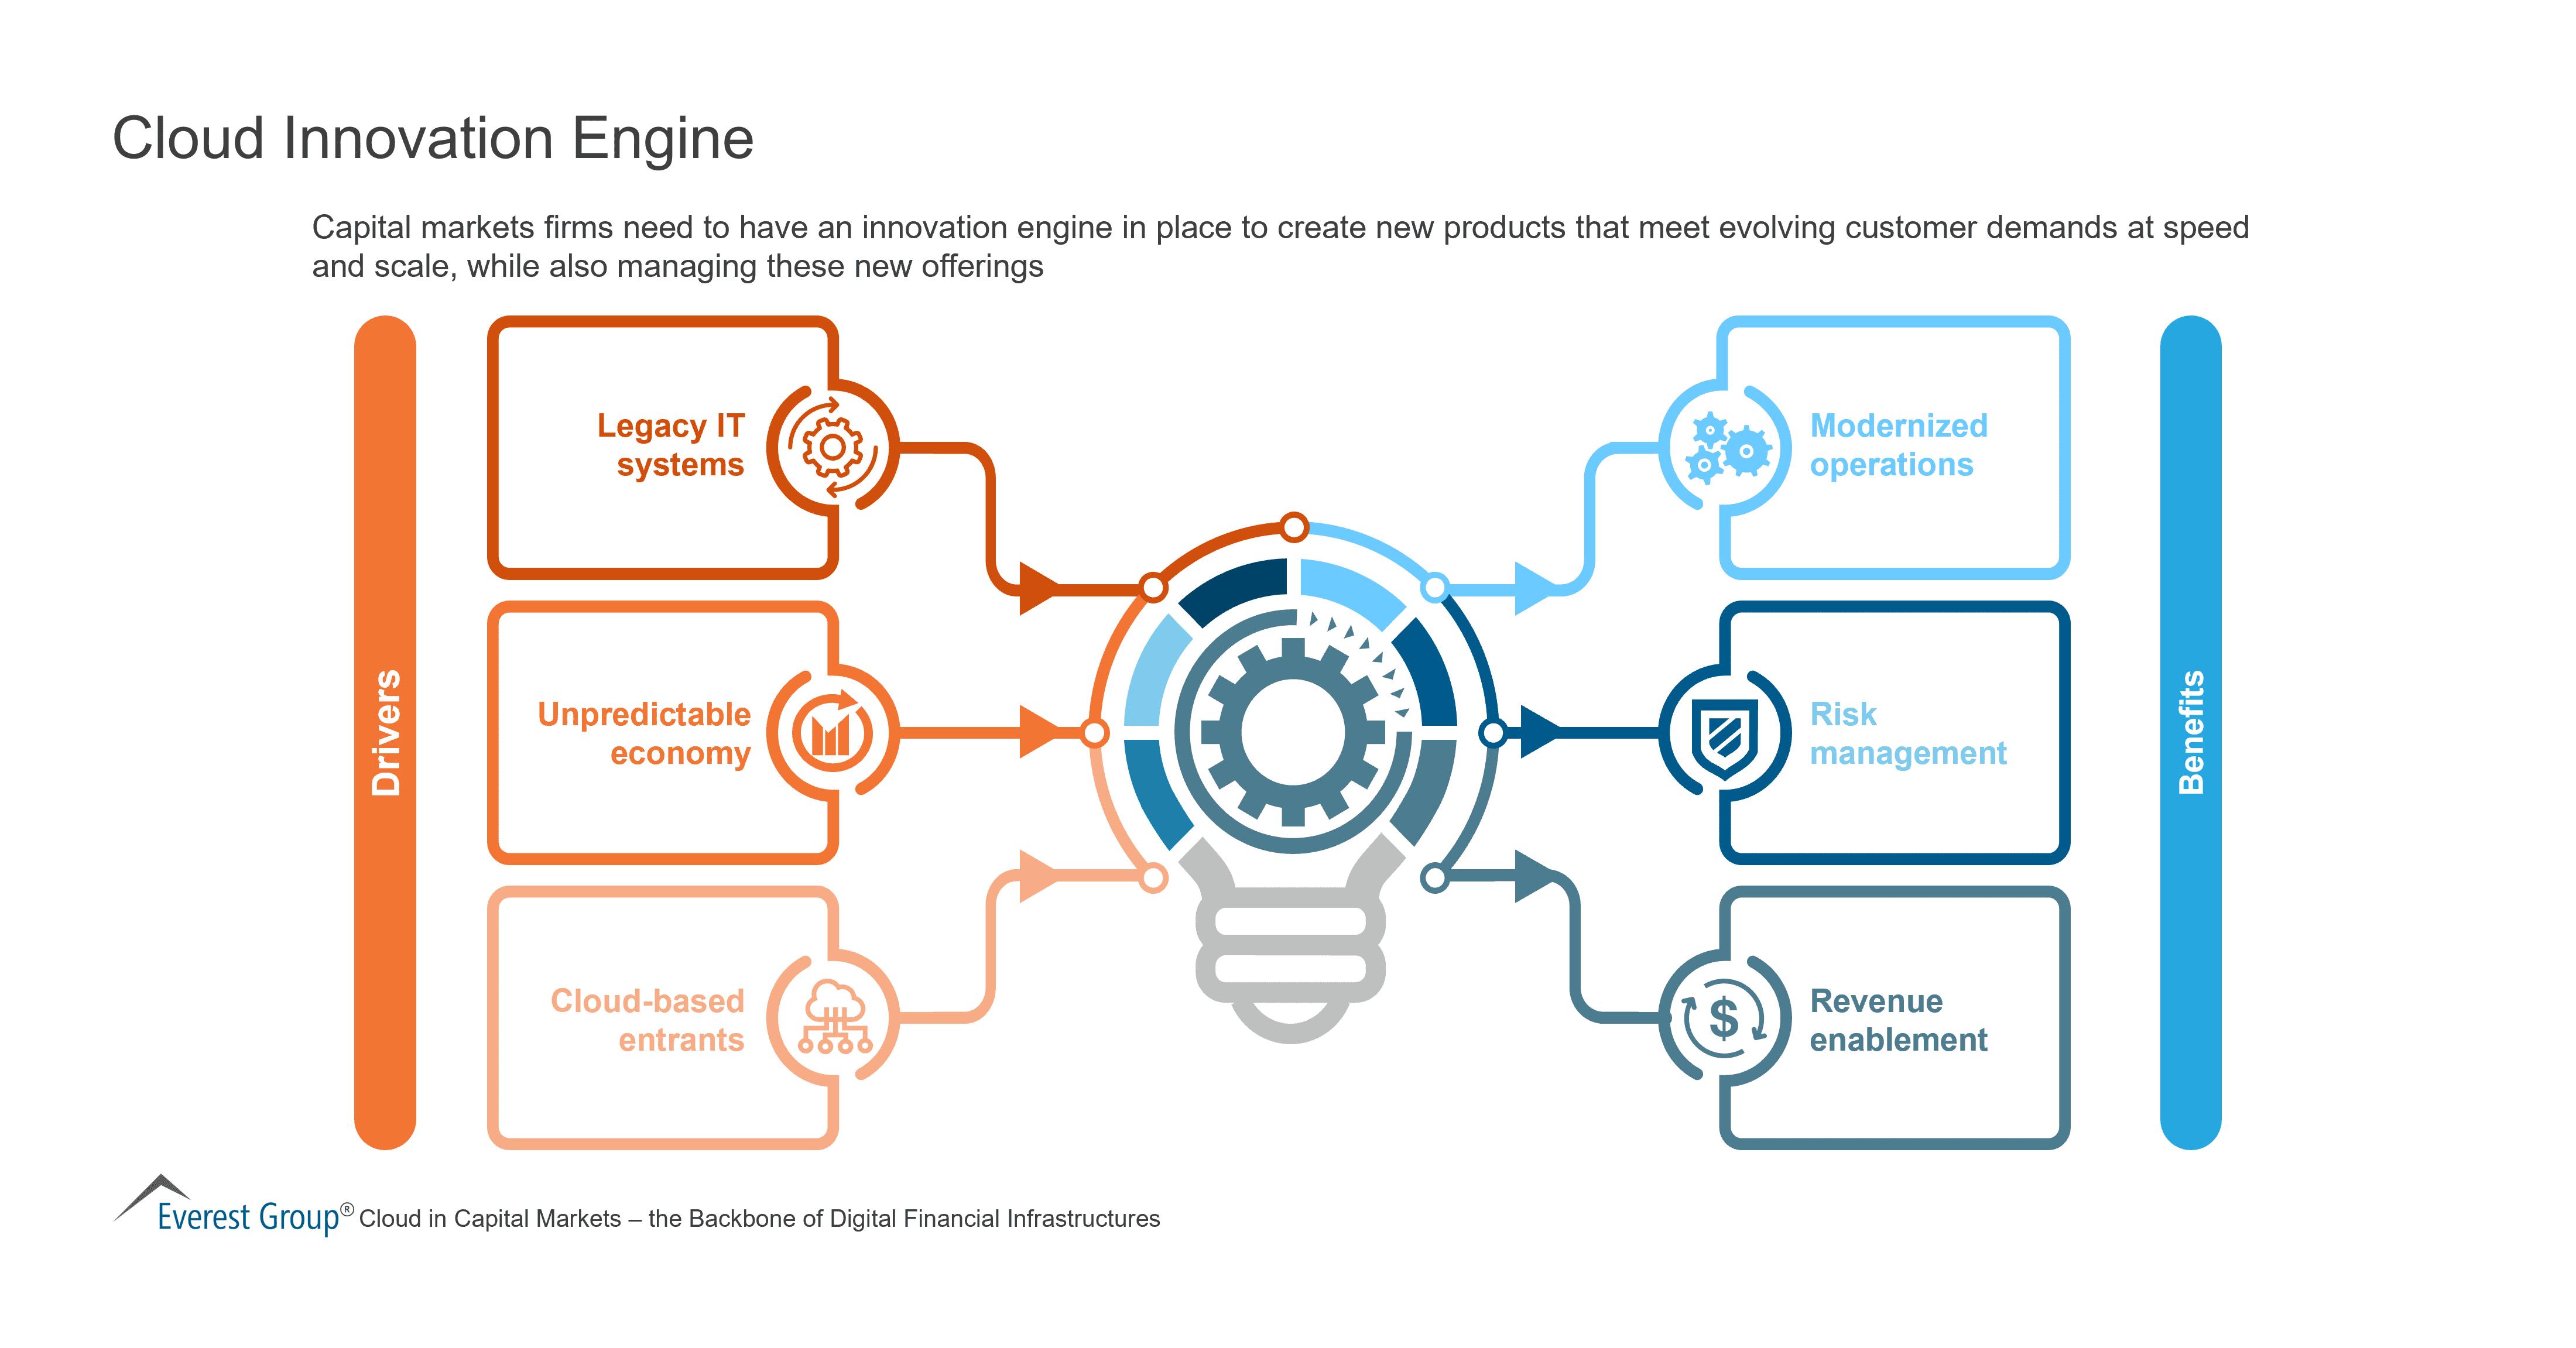 Cloud Innovation Engine